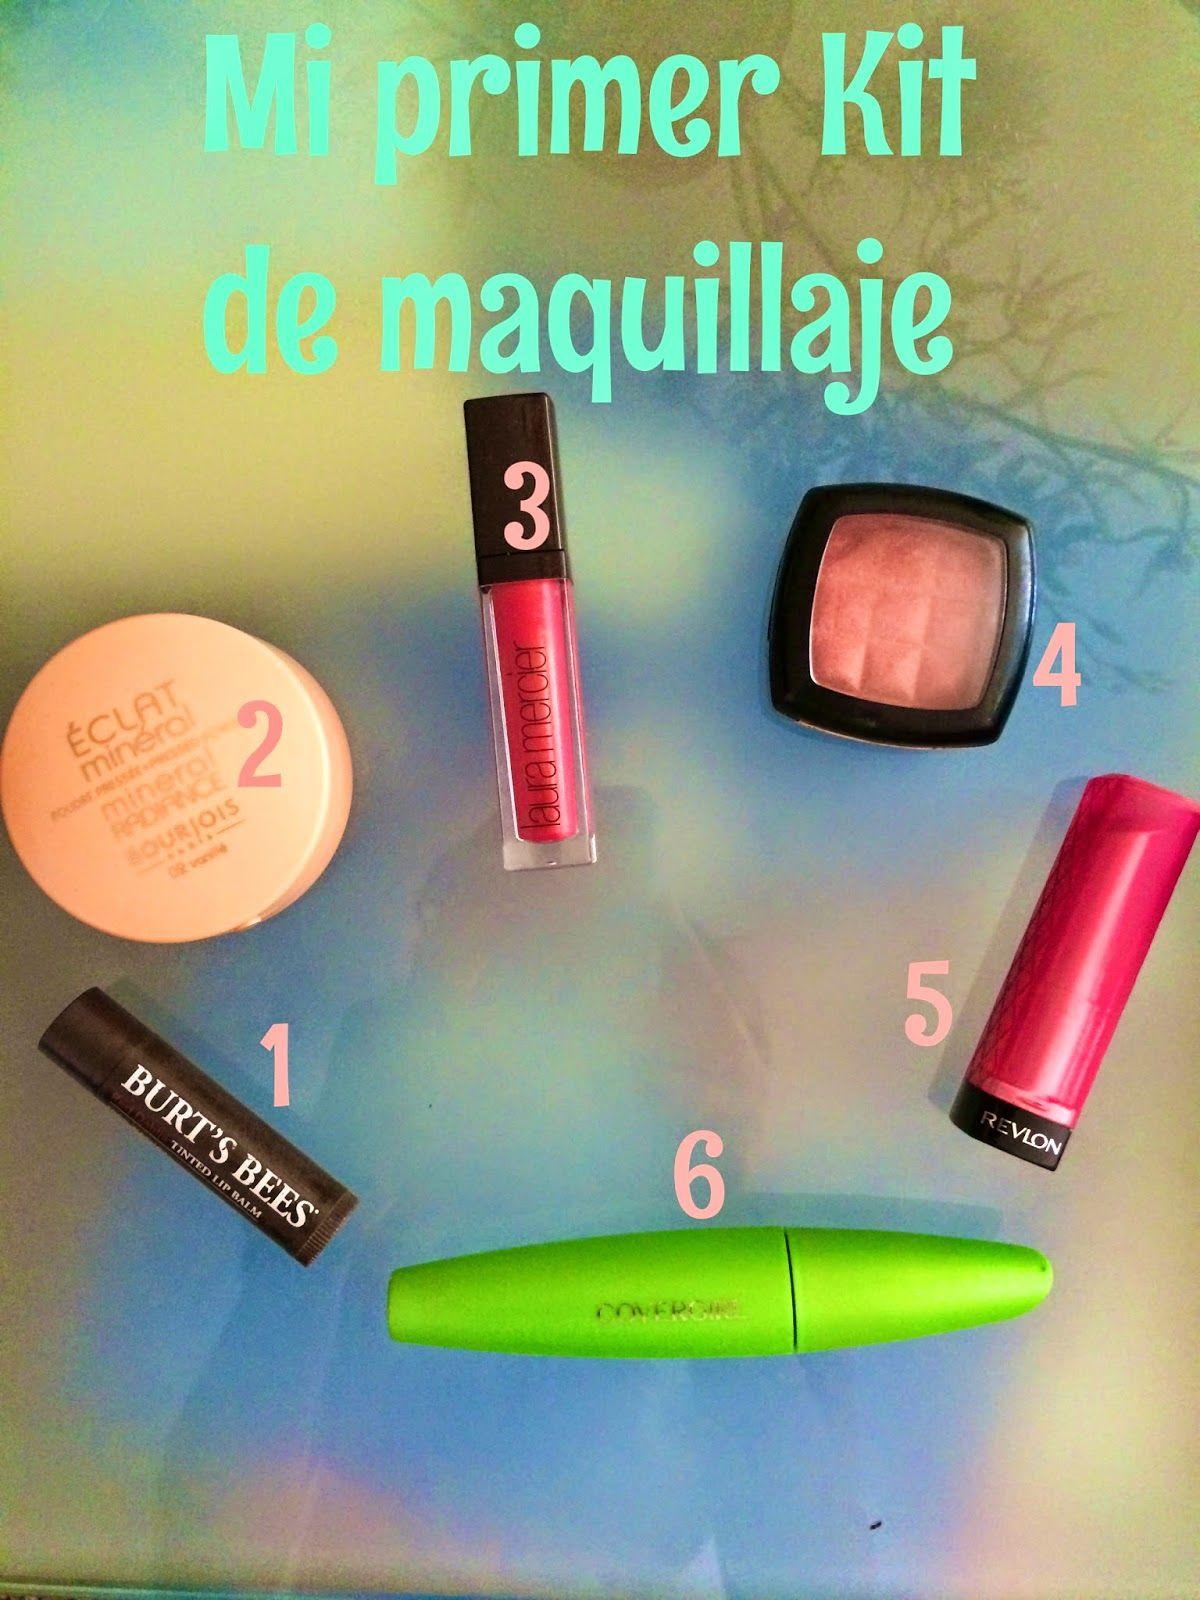 My Beauty Life Mi primer kit de maquillaje (con imágenes